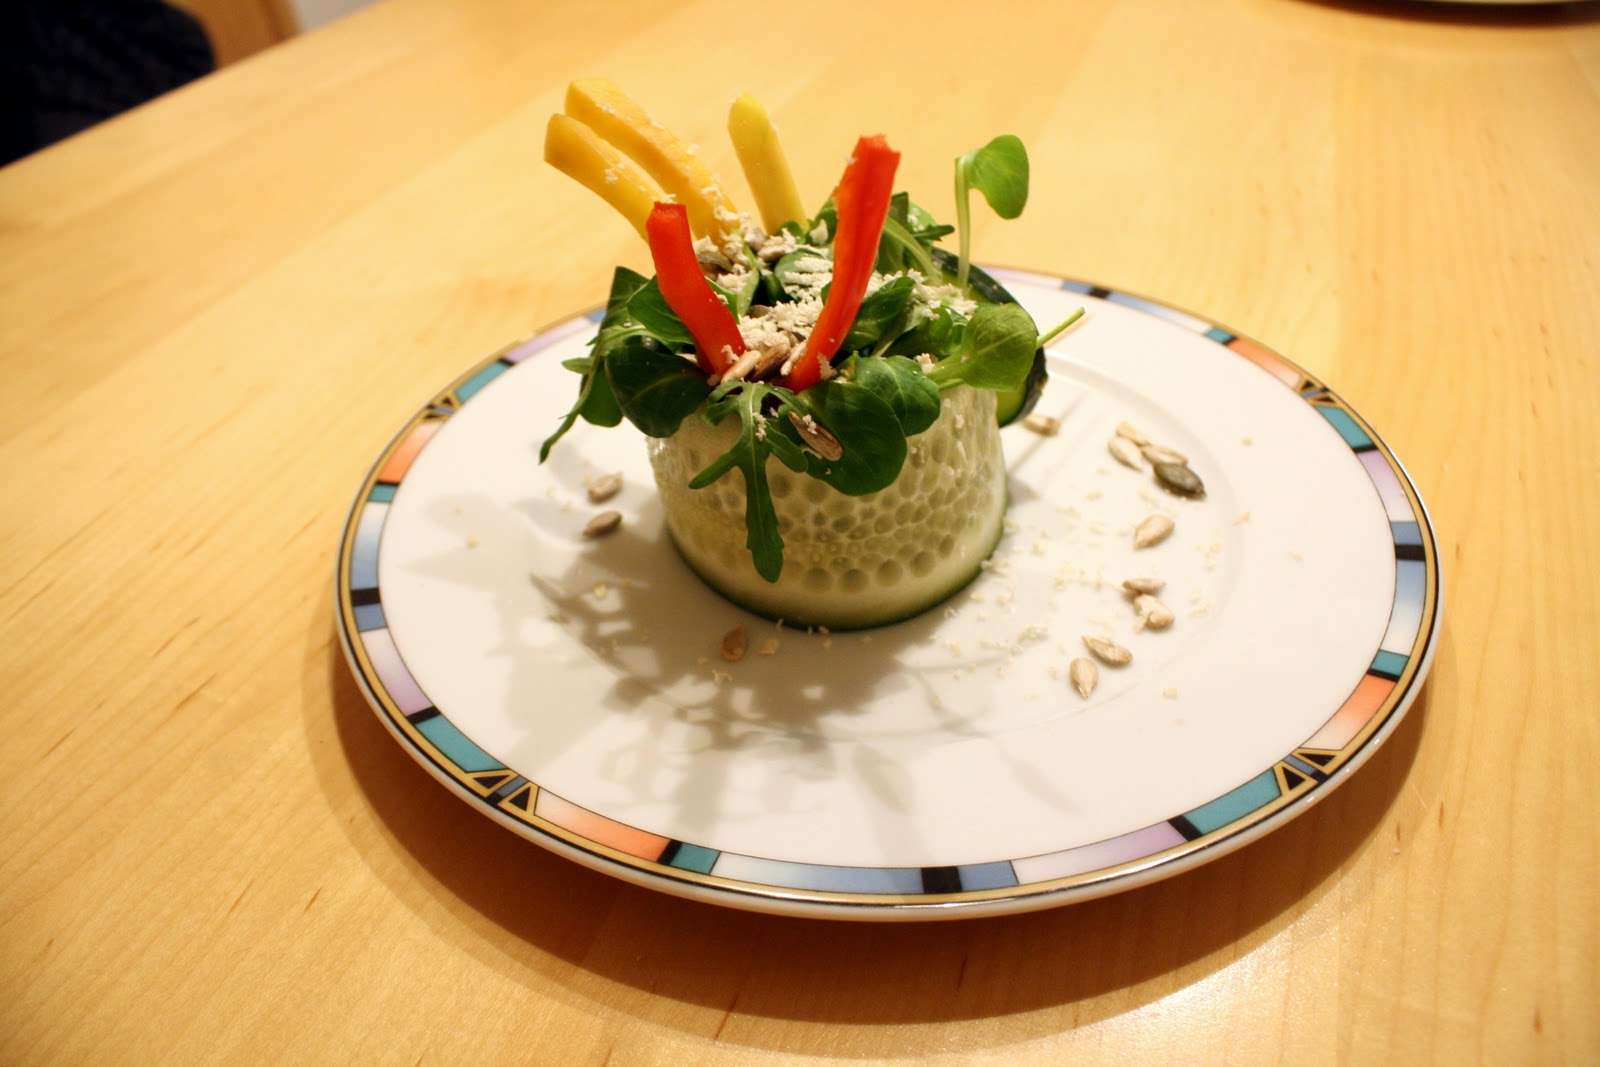 vegan for beginners nussbraten mit so e bratkartoffeln und salat. Black Bedroom Furniture Sets. Home Design Ideas